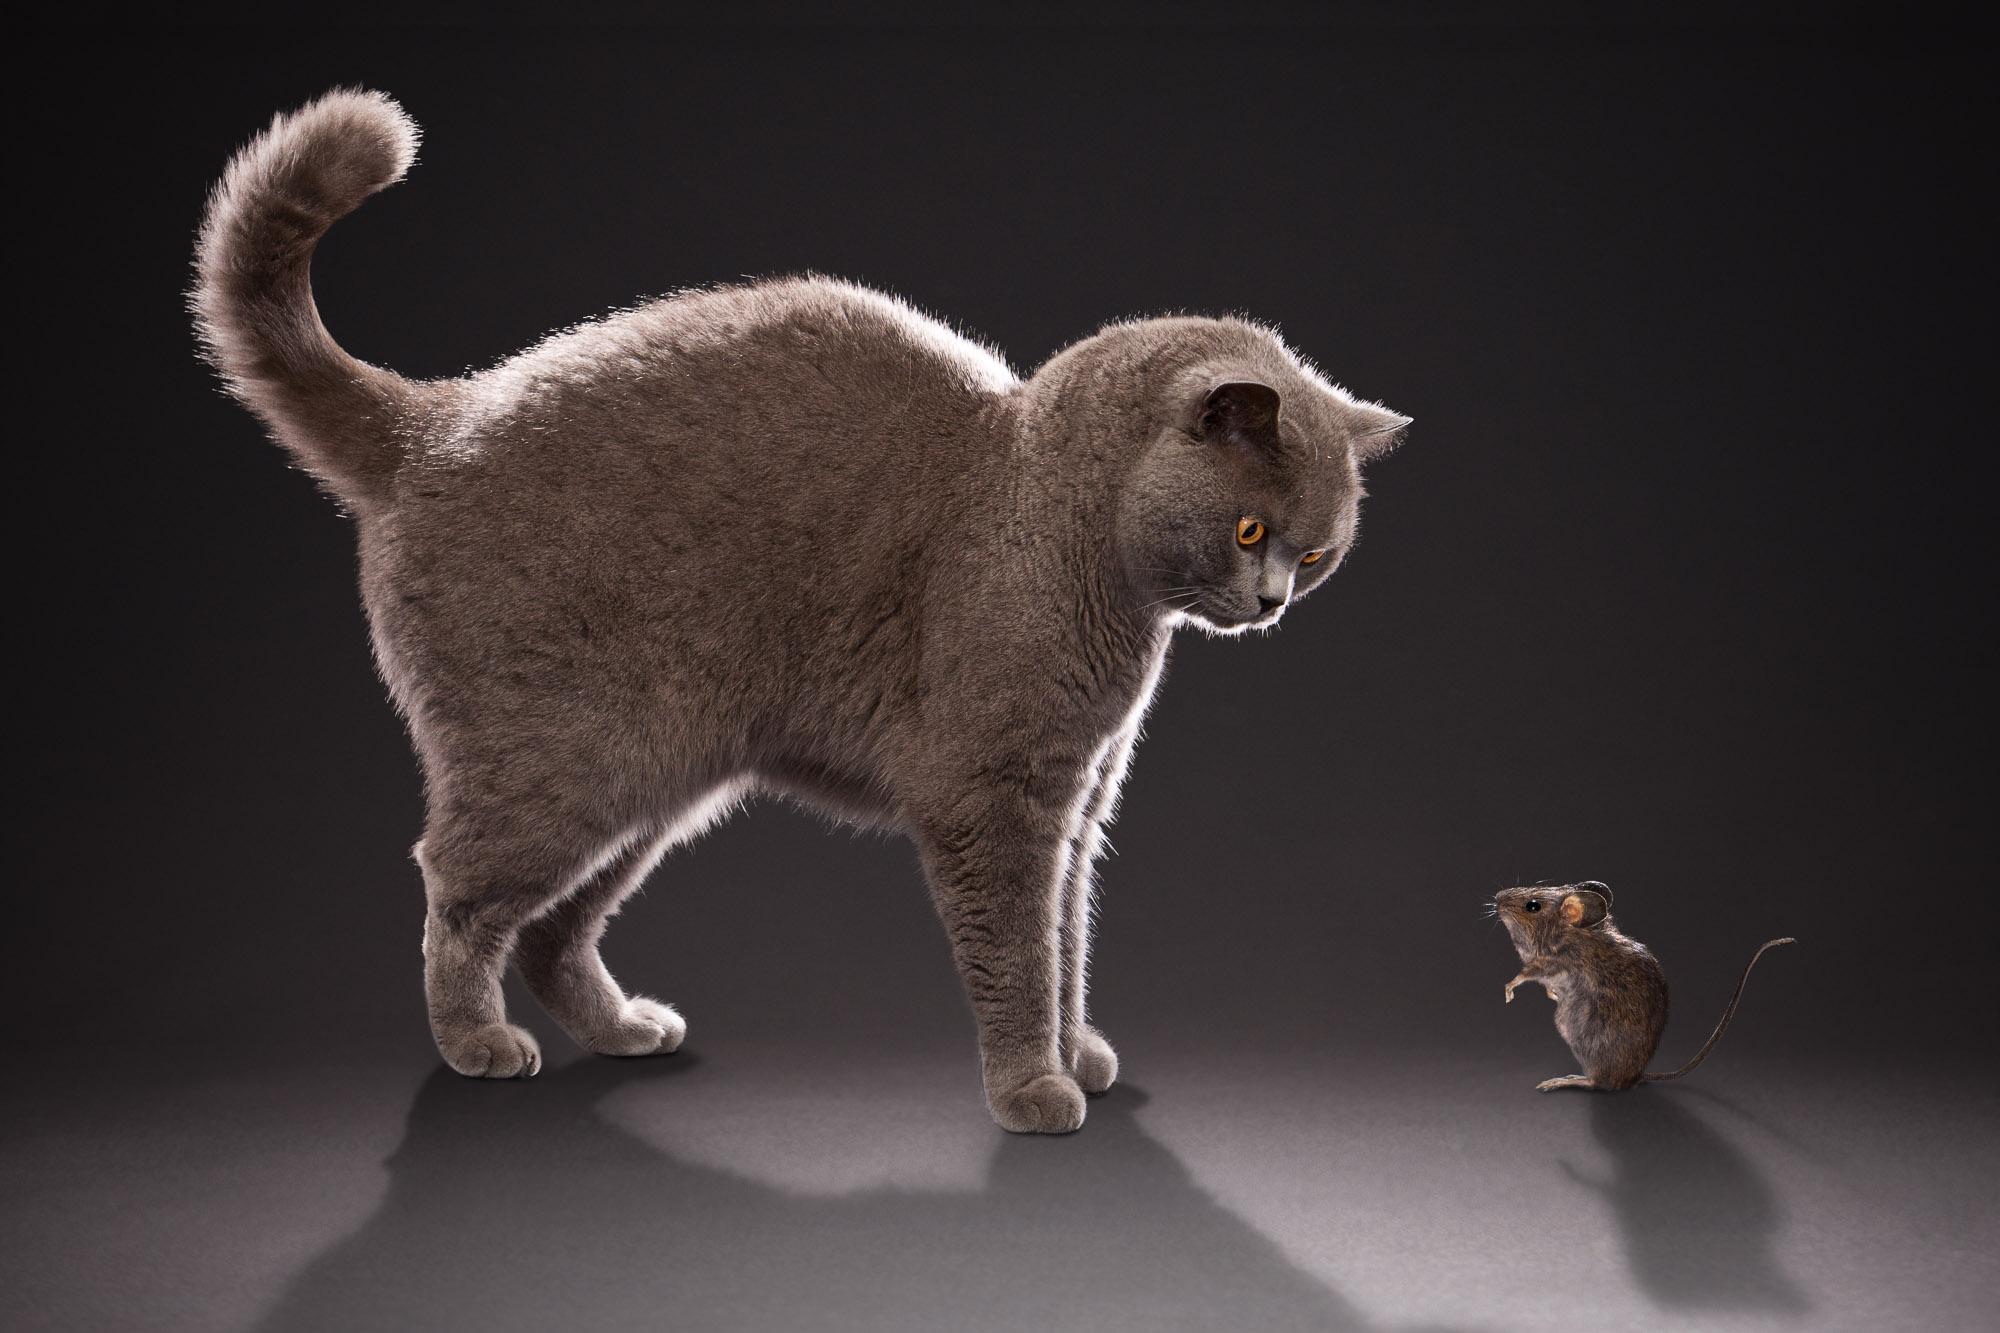 Tim Platt - Cat and Mouse